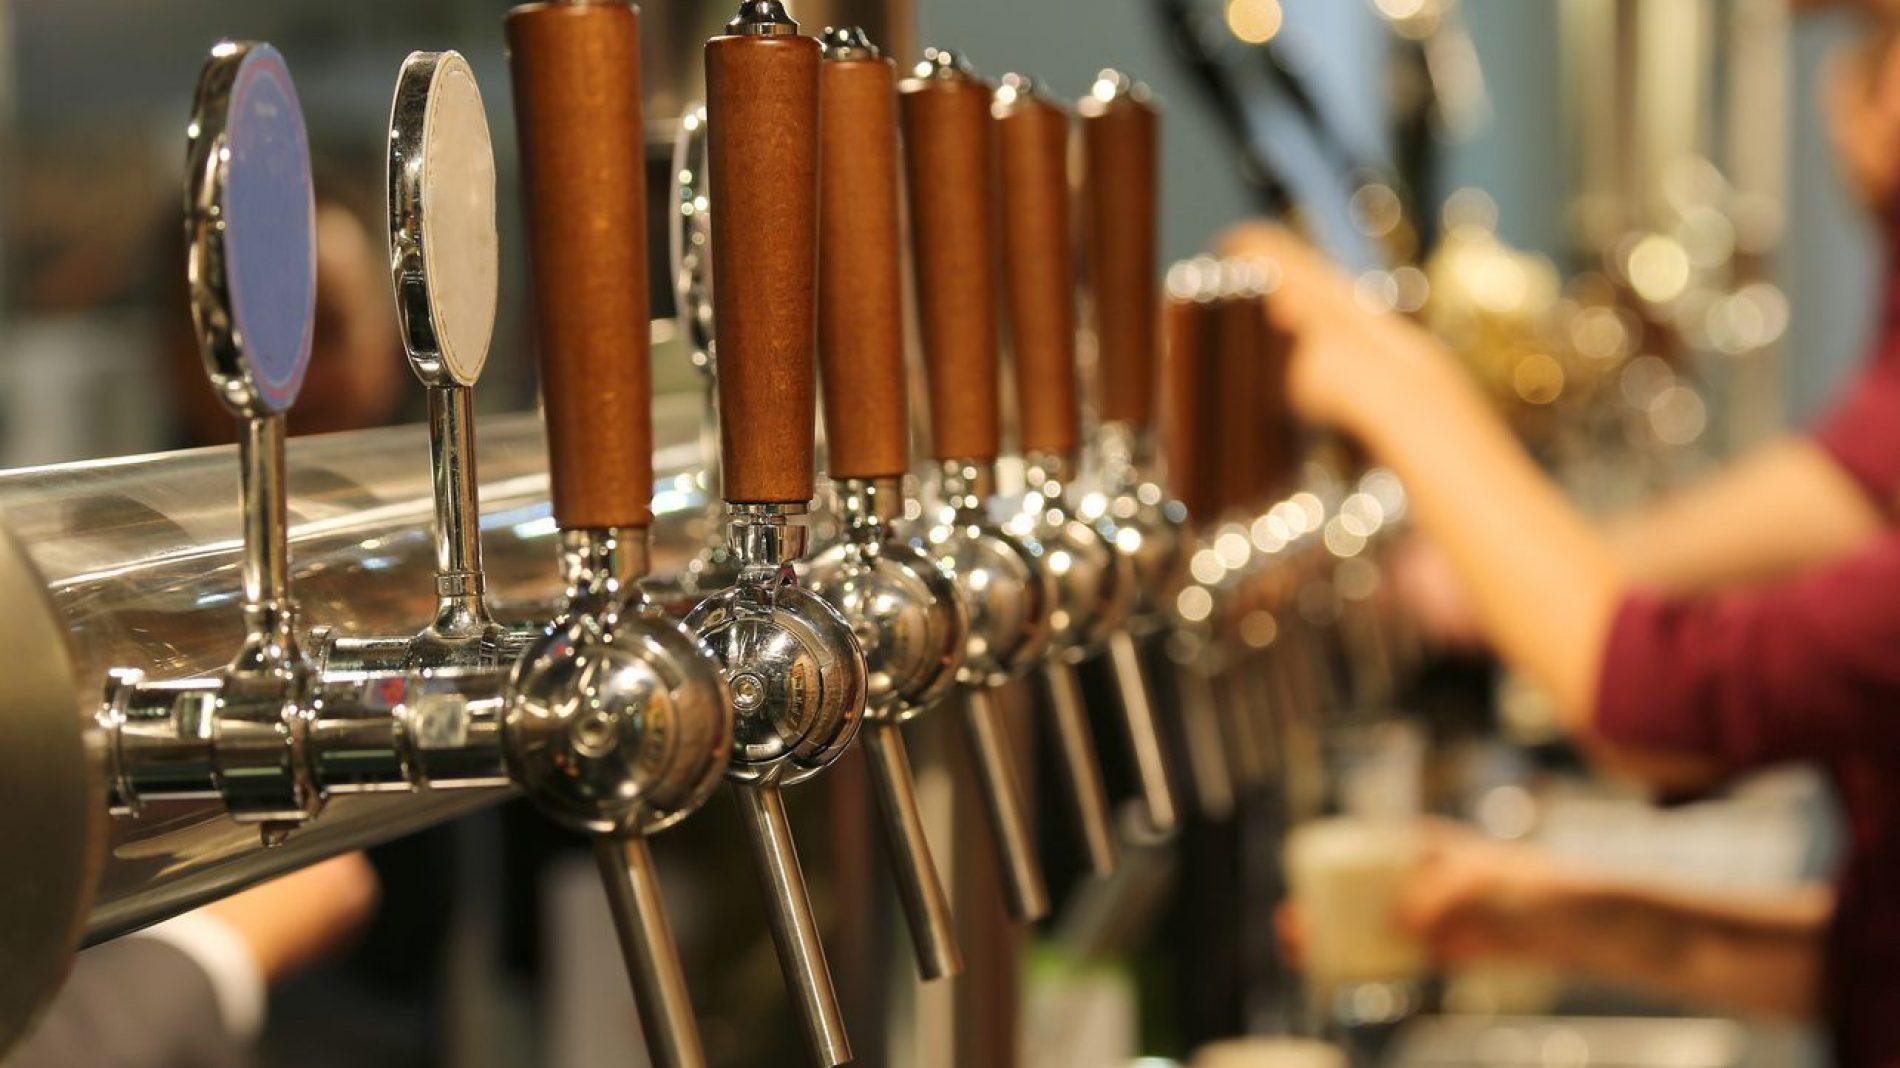 beer-taps-in-bar-binge-drinking